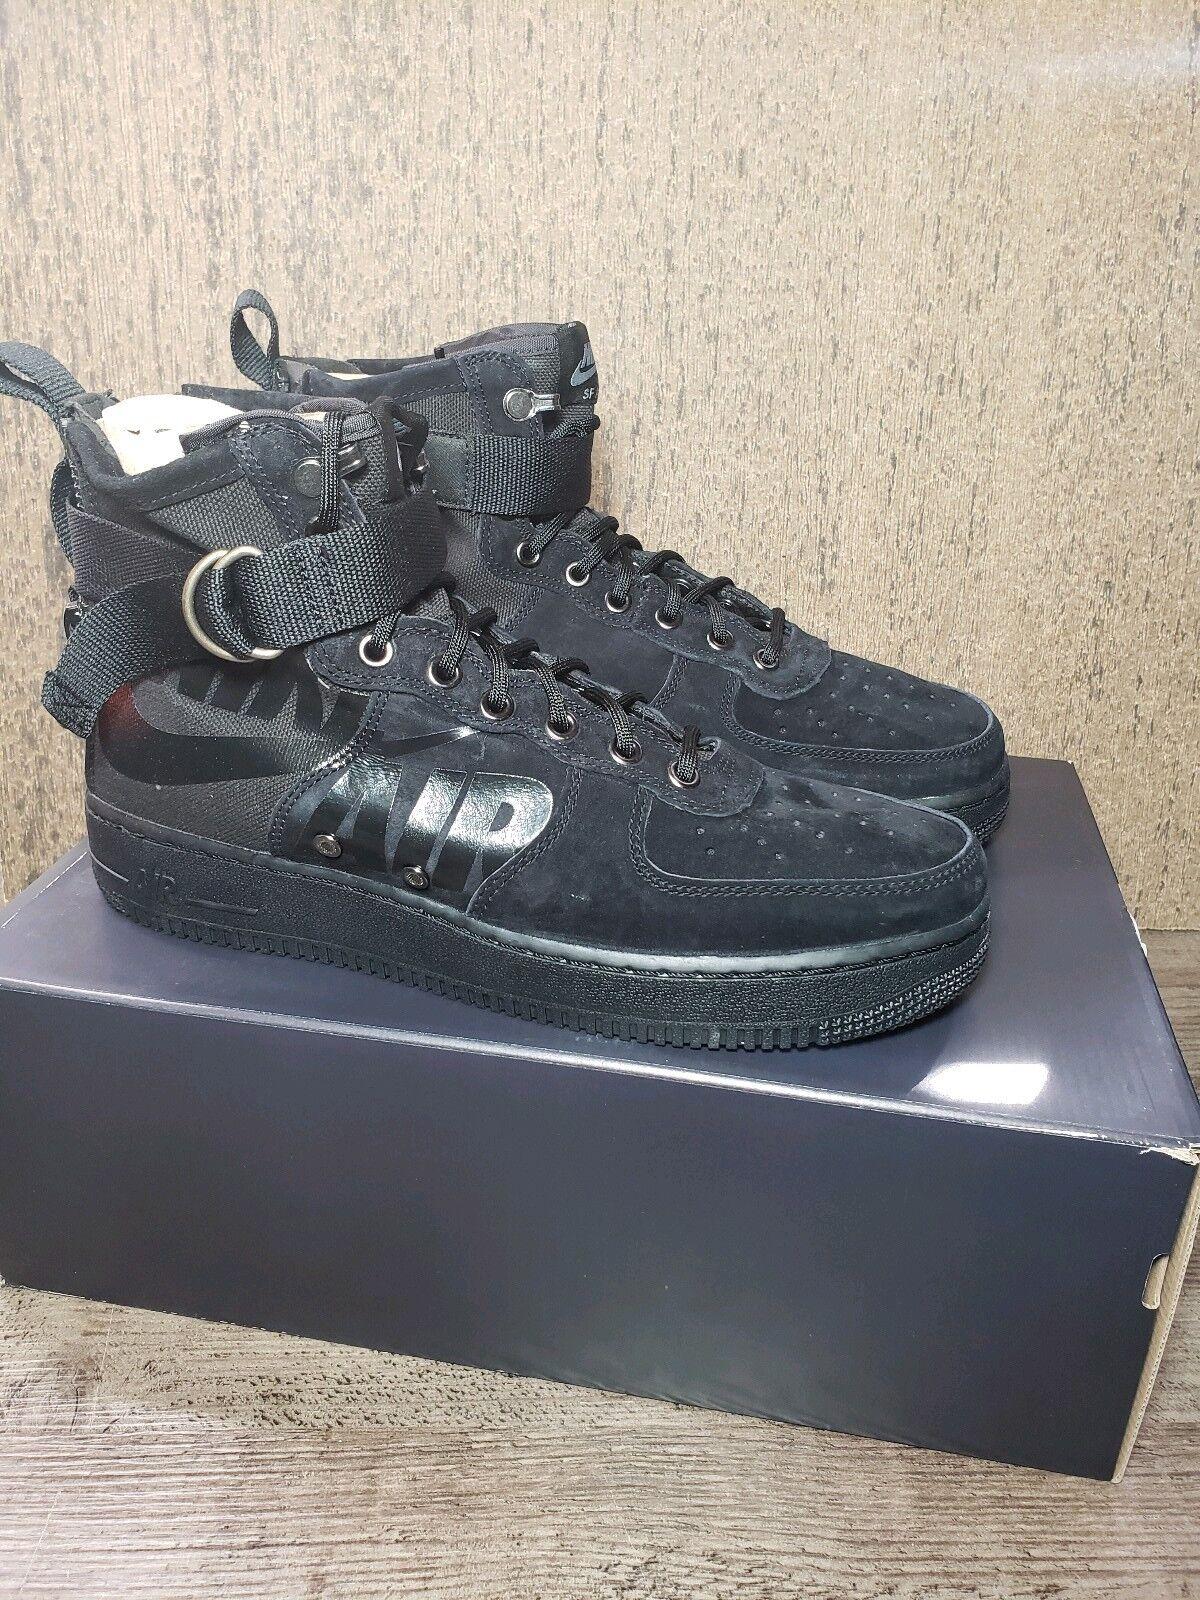 87618fe39b8c Nike SF AIR 1 MID shoes Black Cool Grey 917753-008 Men s Size 8 AF1 Force  nsnvti3118-Athletic Shoes - climbing.mbrooksfit.com